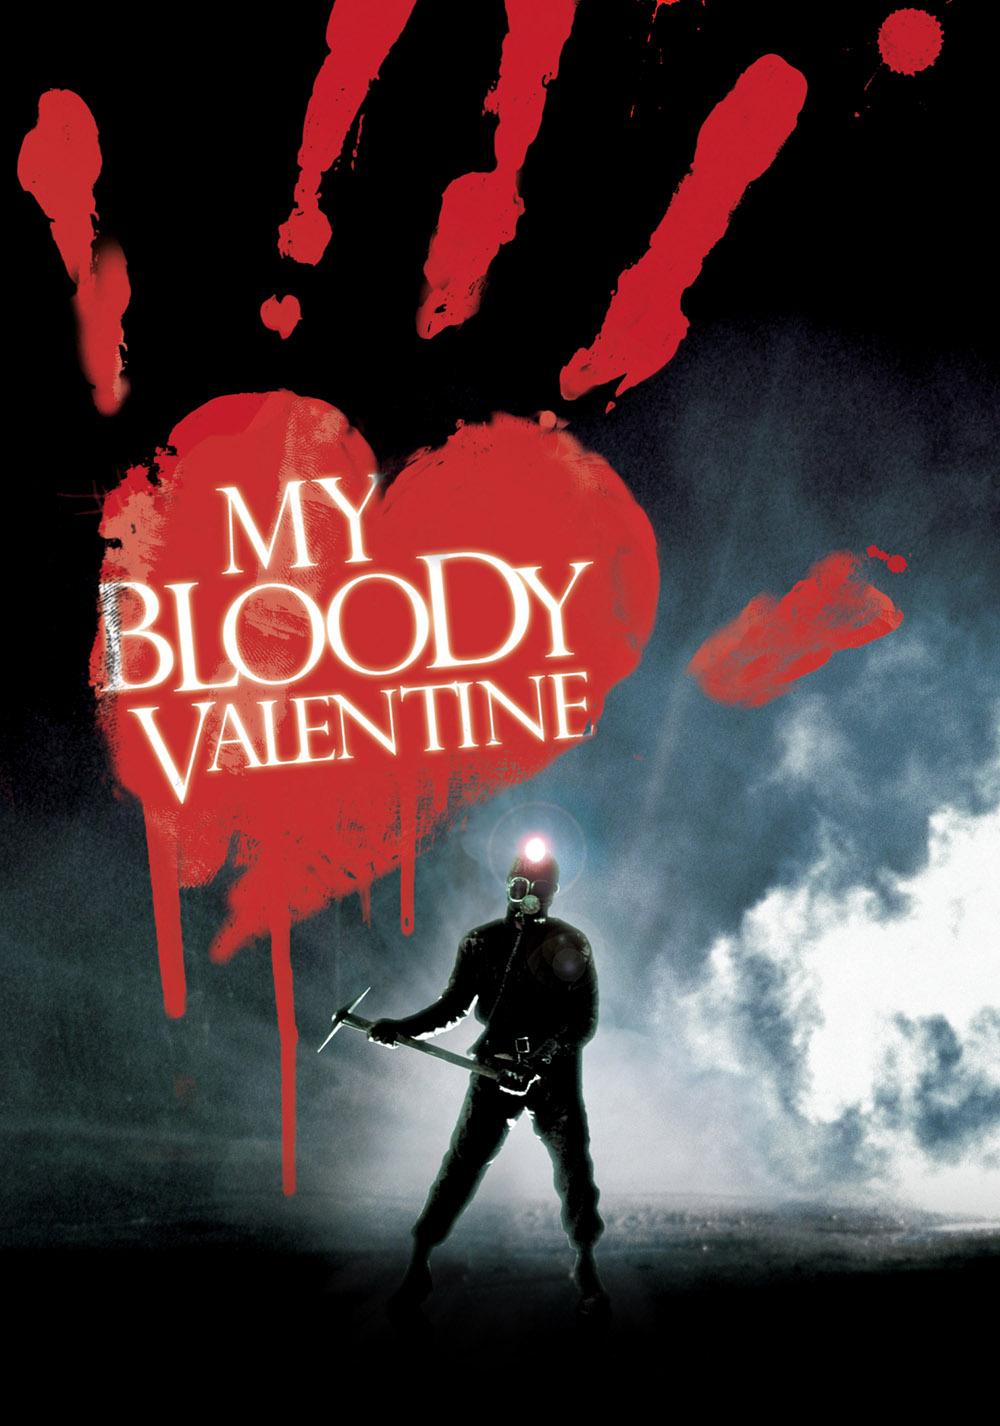 my-bloody-valentine-5246dbf86f57d.jpg